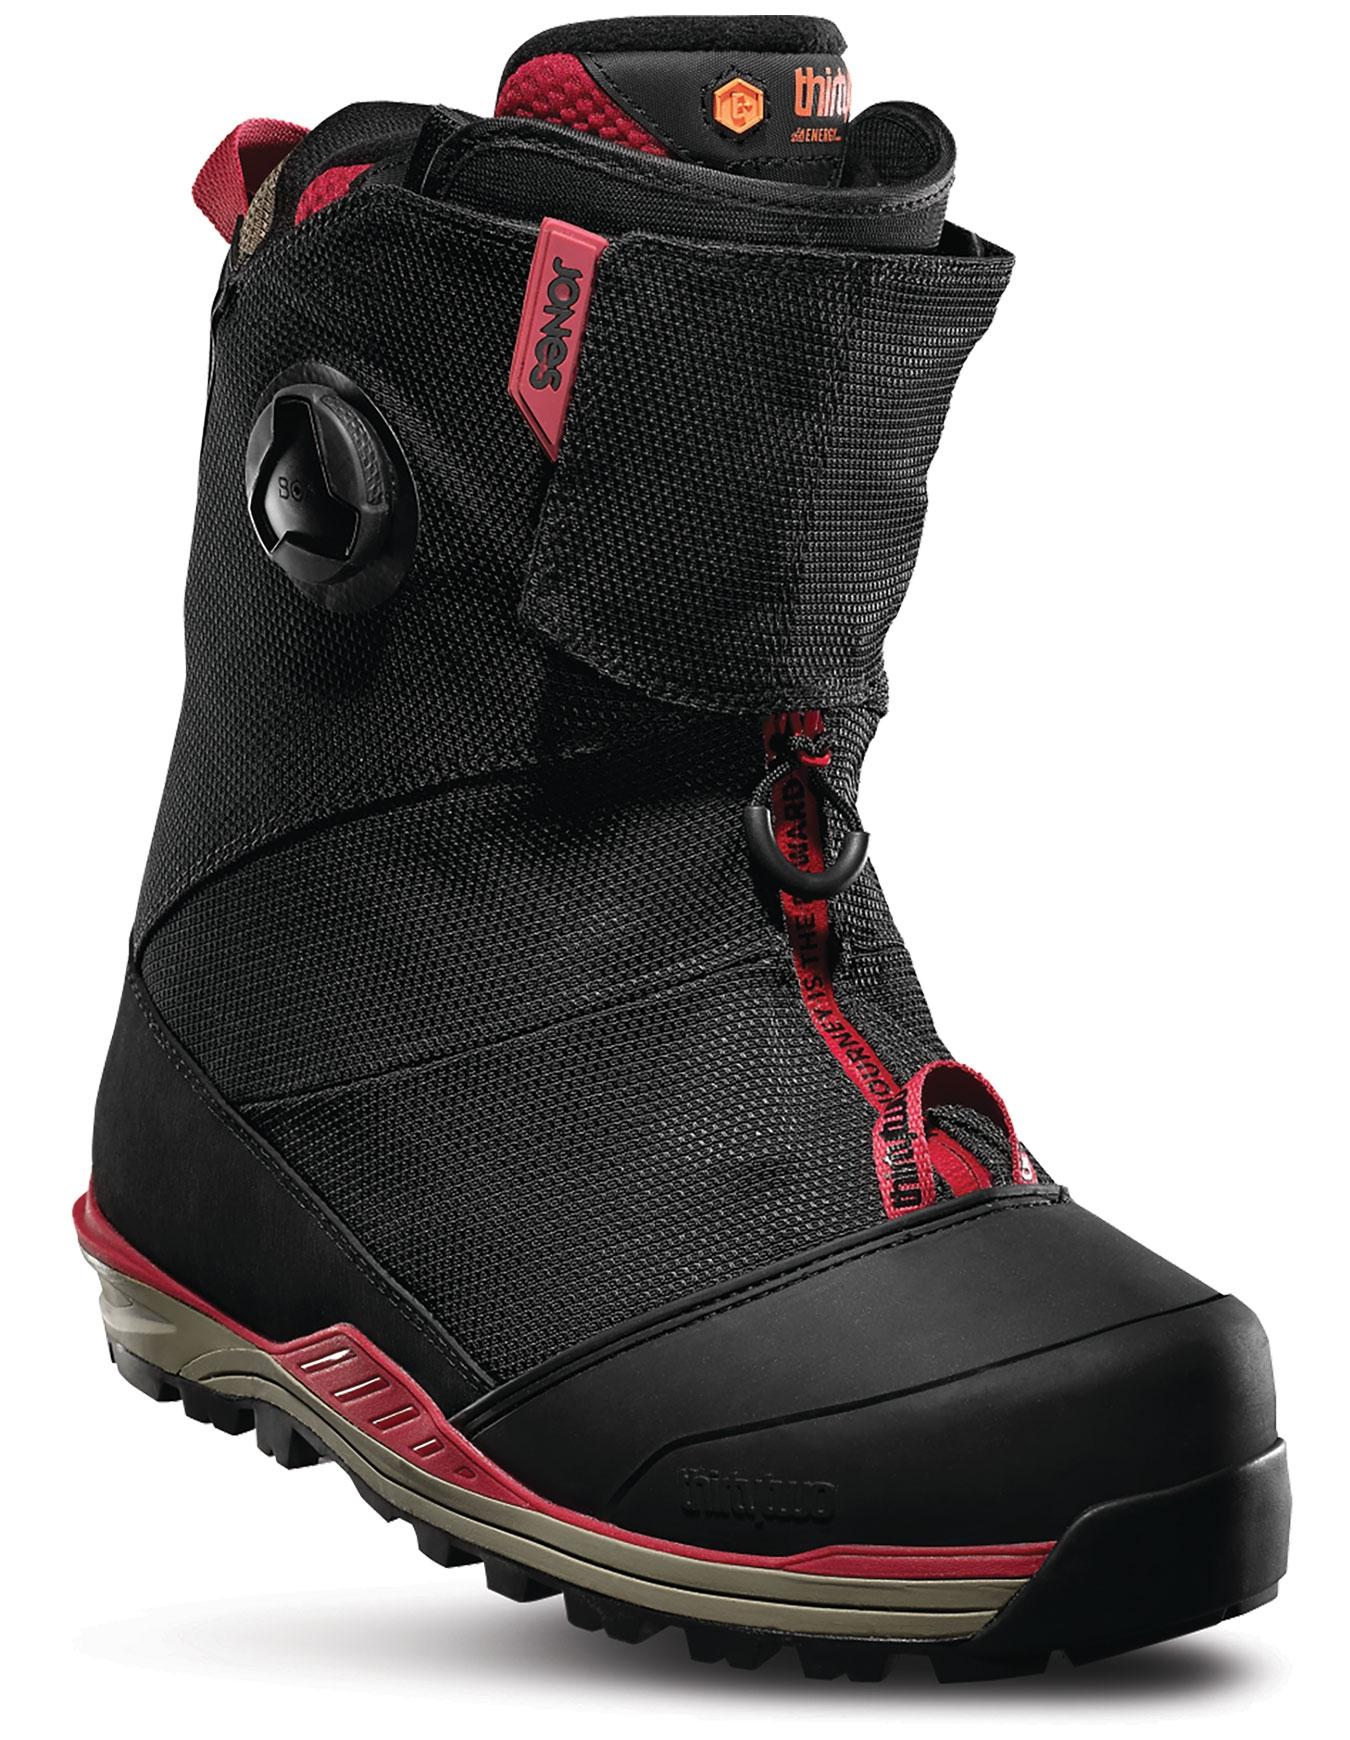 https://www.snowleader.com/jones-mtb-black-tan-red-2020-THRT00010.html